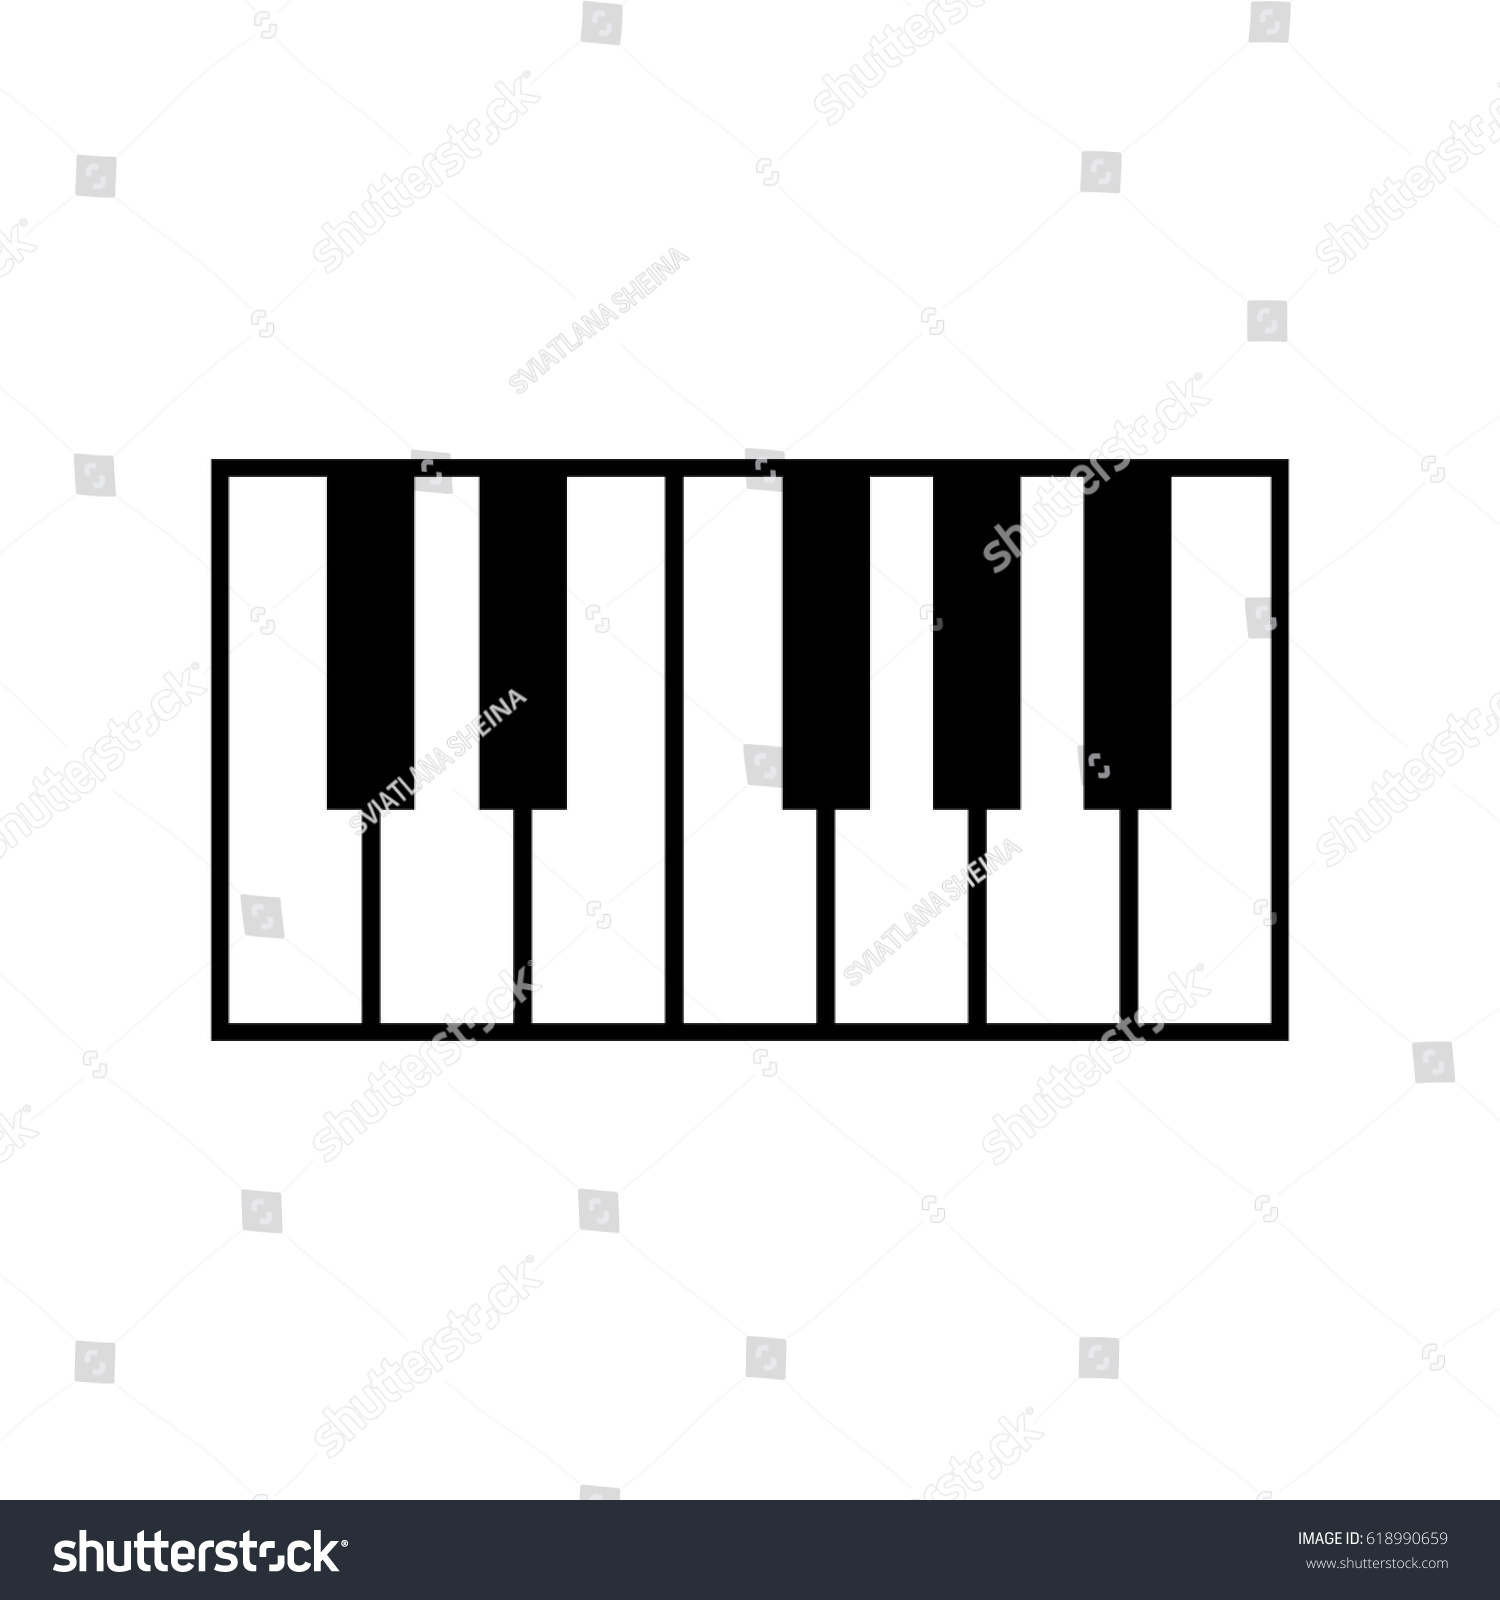 Piano Keyboard Icon Stock Vector 618990659 - Shutterstock